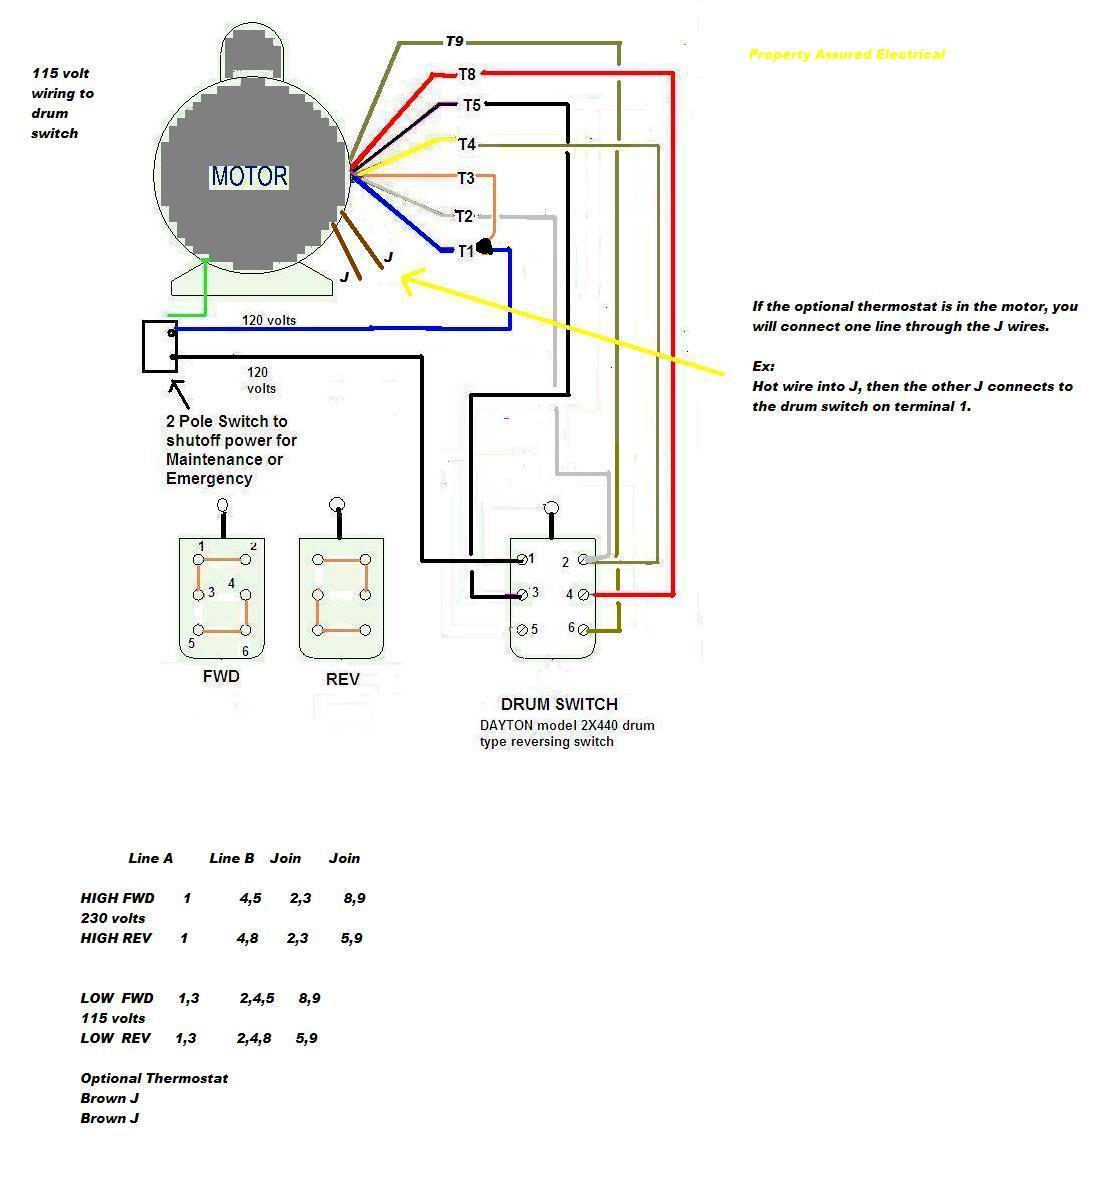 hight resolution of 230v single phase plug wiring wiring diagrams the 208 plug wiring diagram wiring diagram 230v single